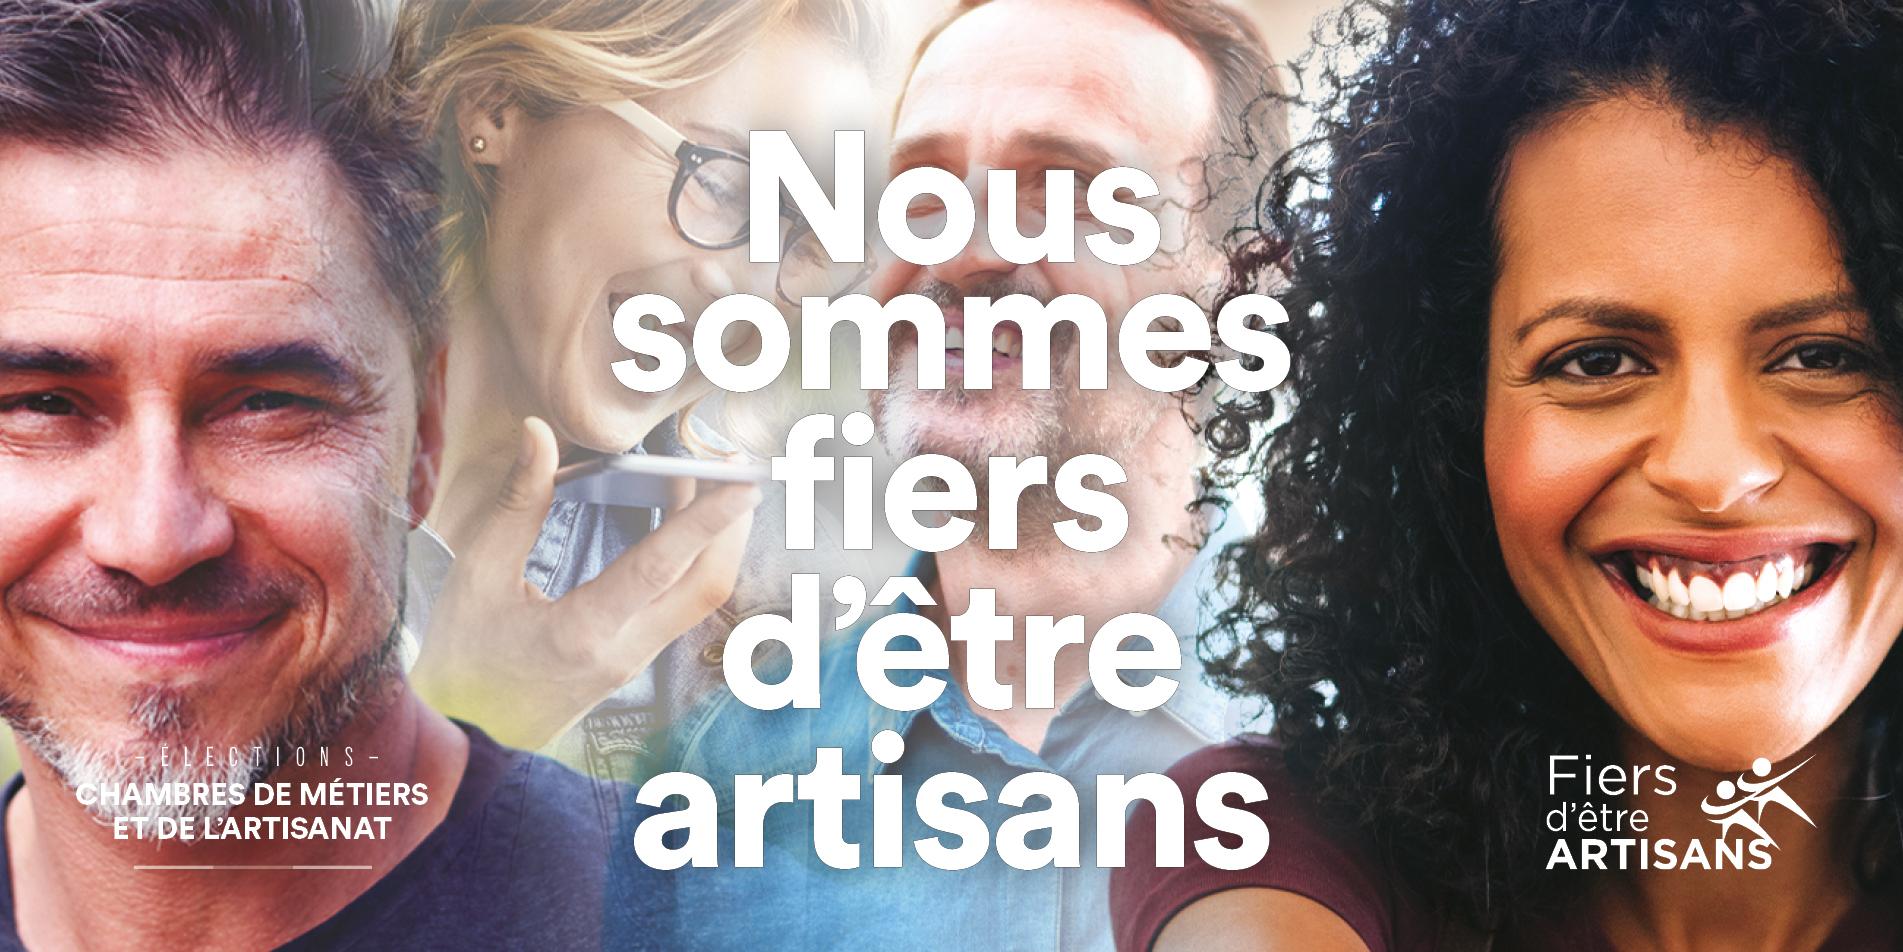 fiers_detre_artisans